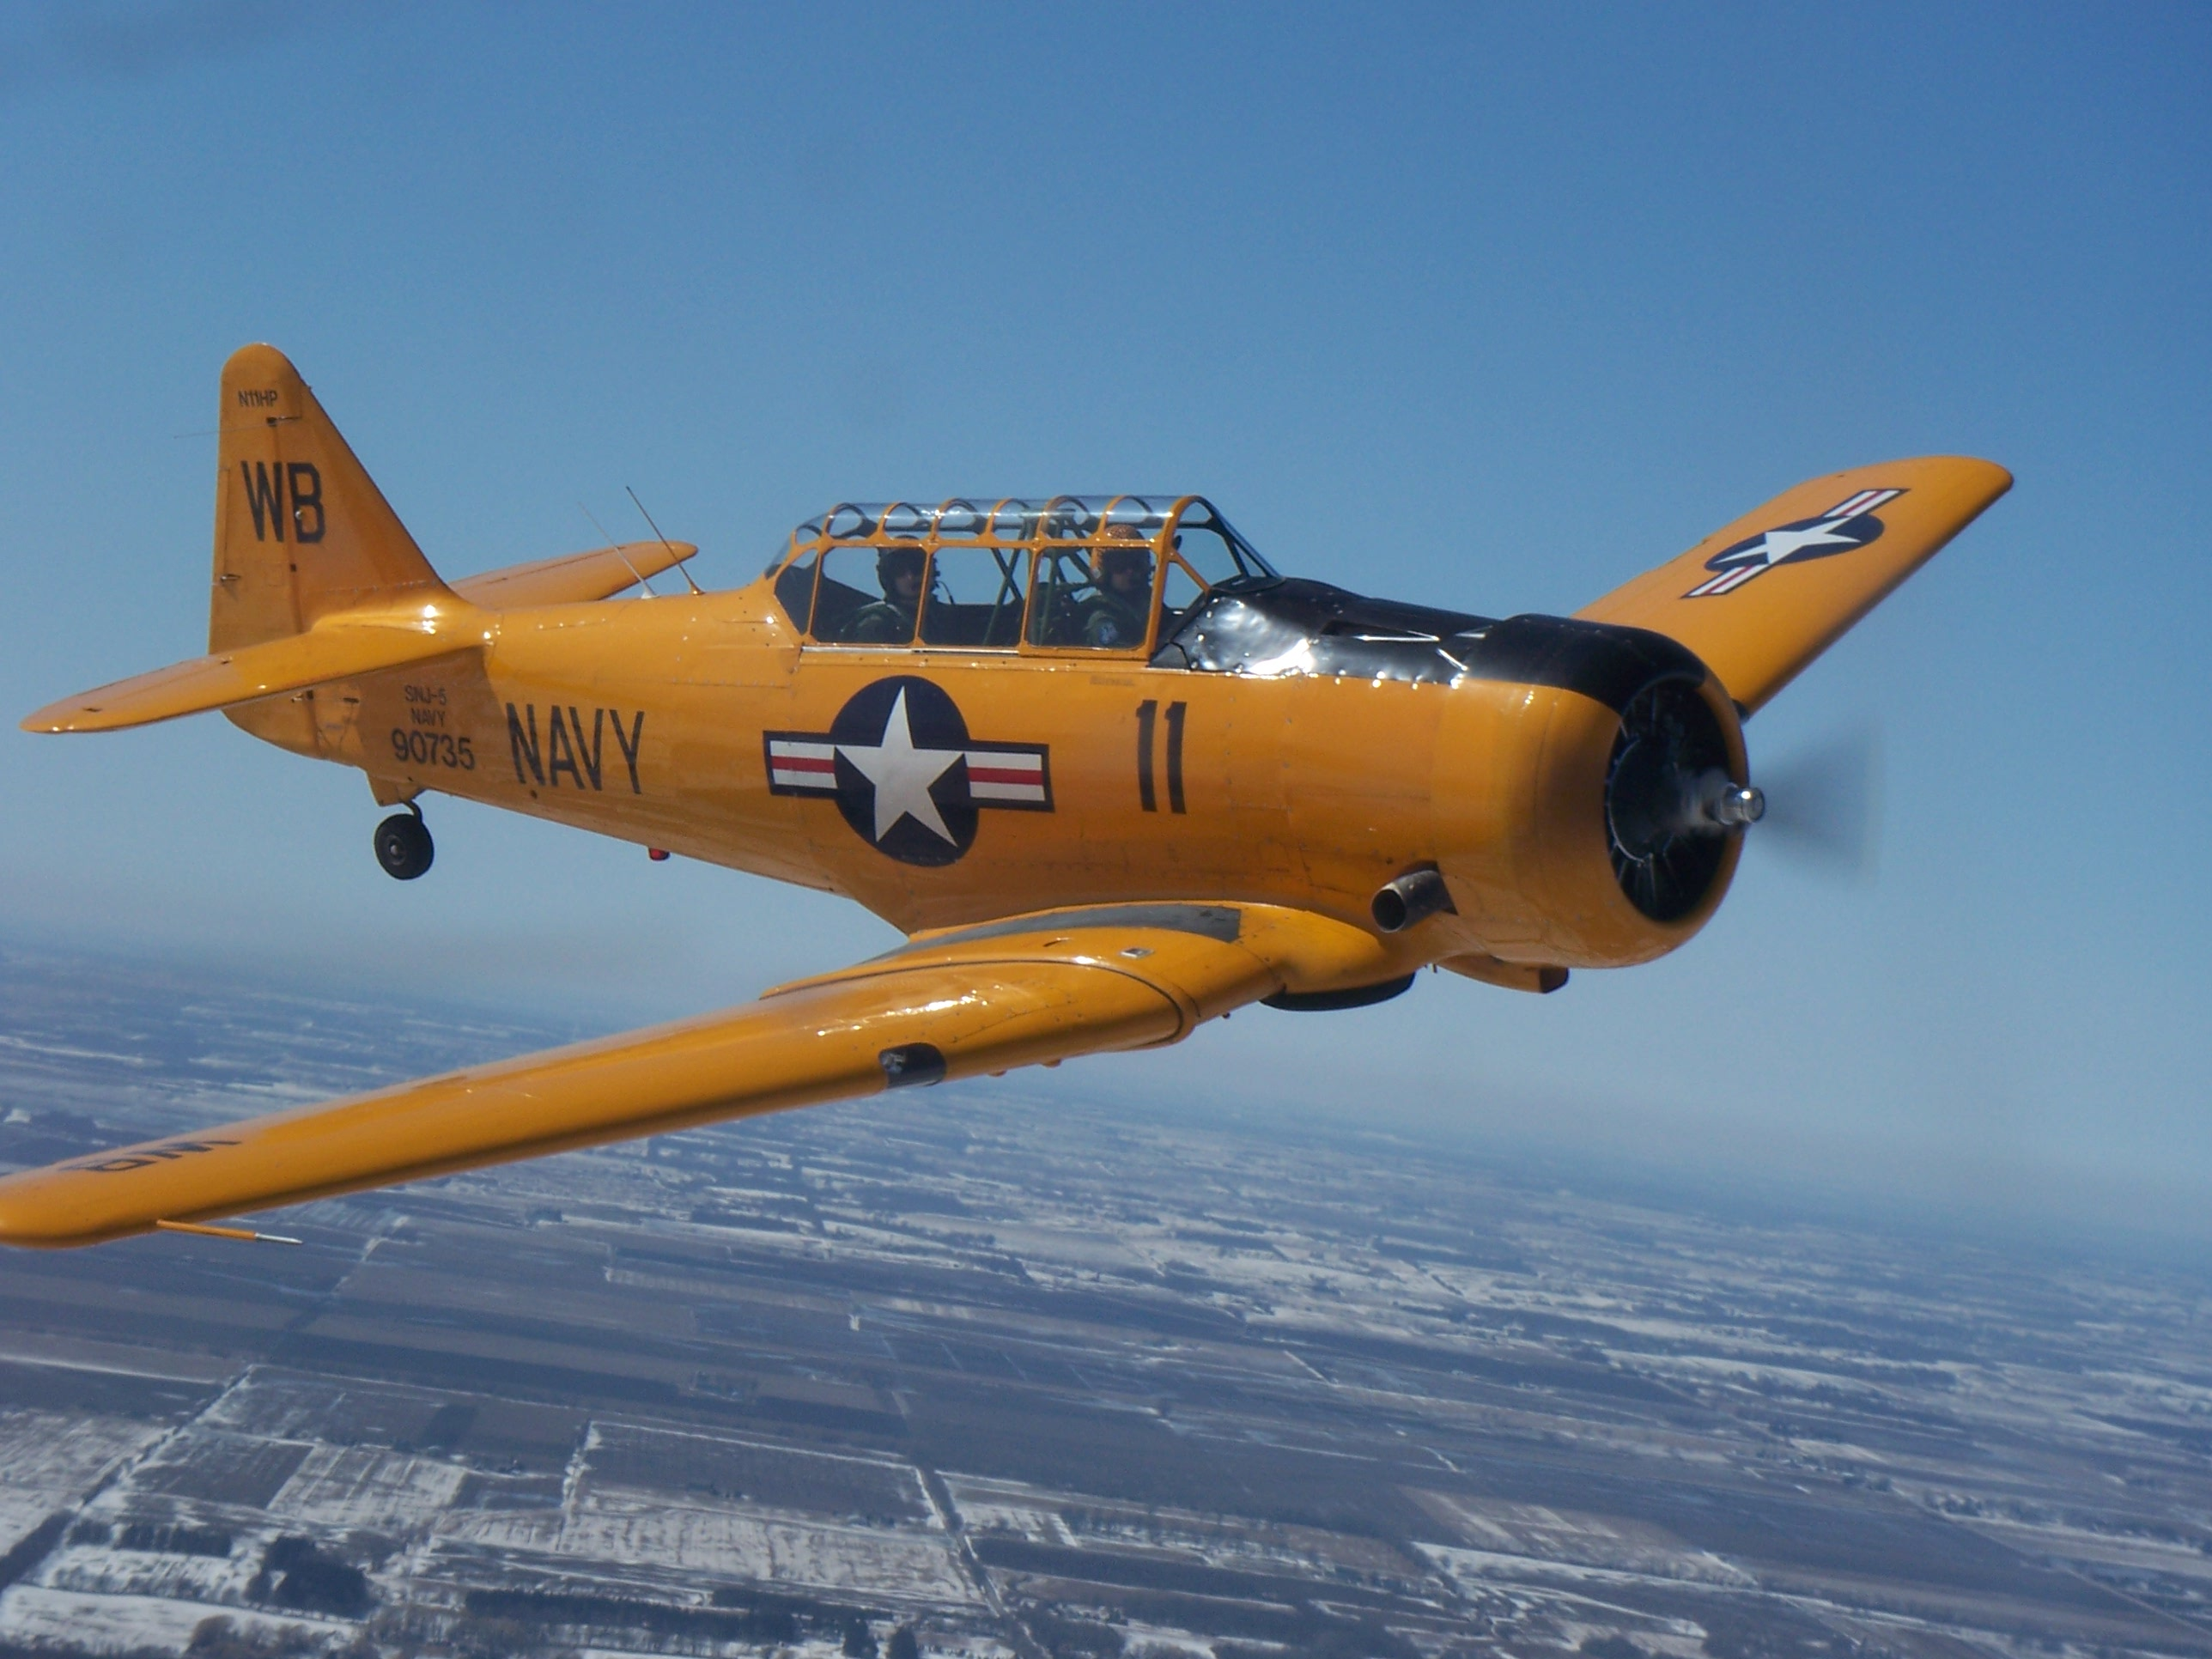 T-6 Texan Warbird Ride in Chicago